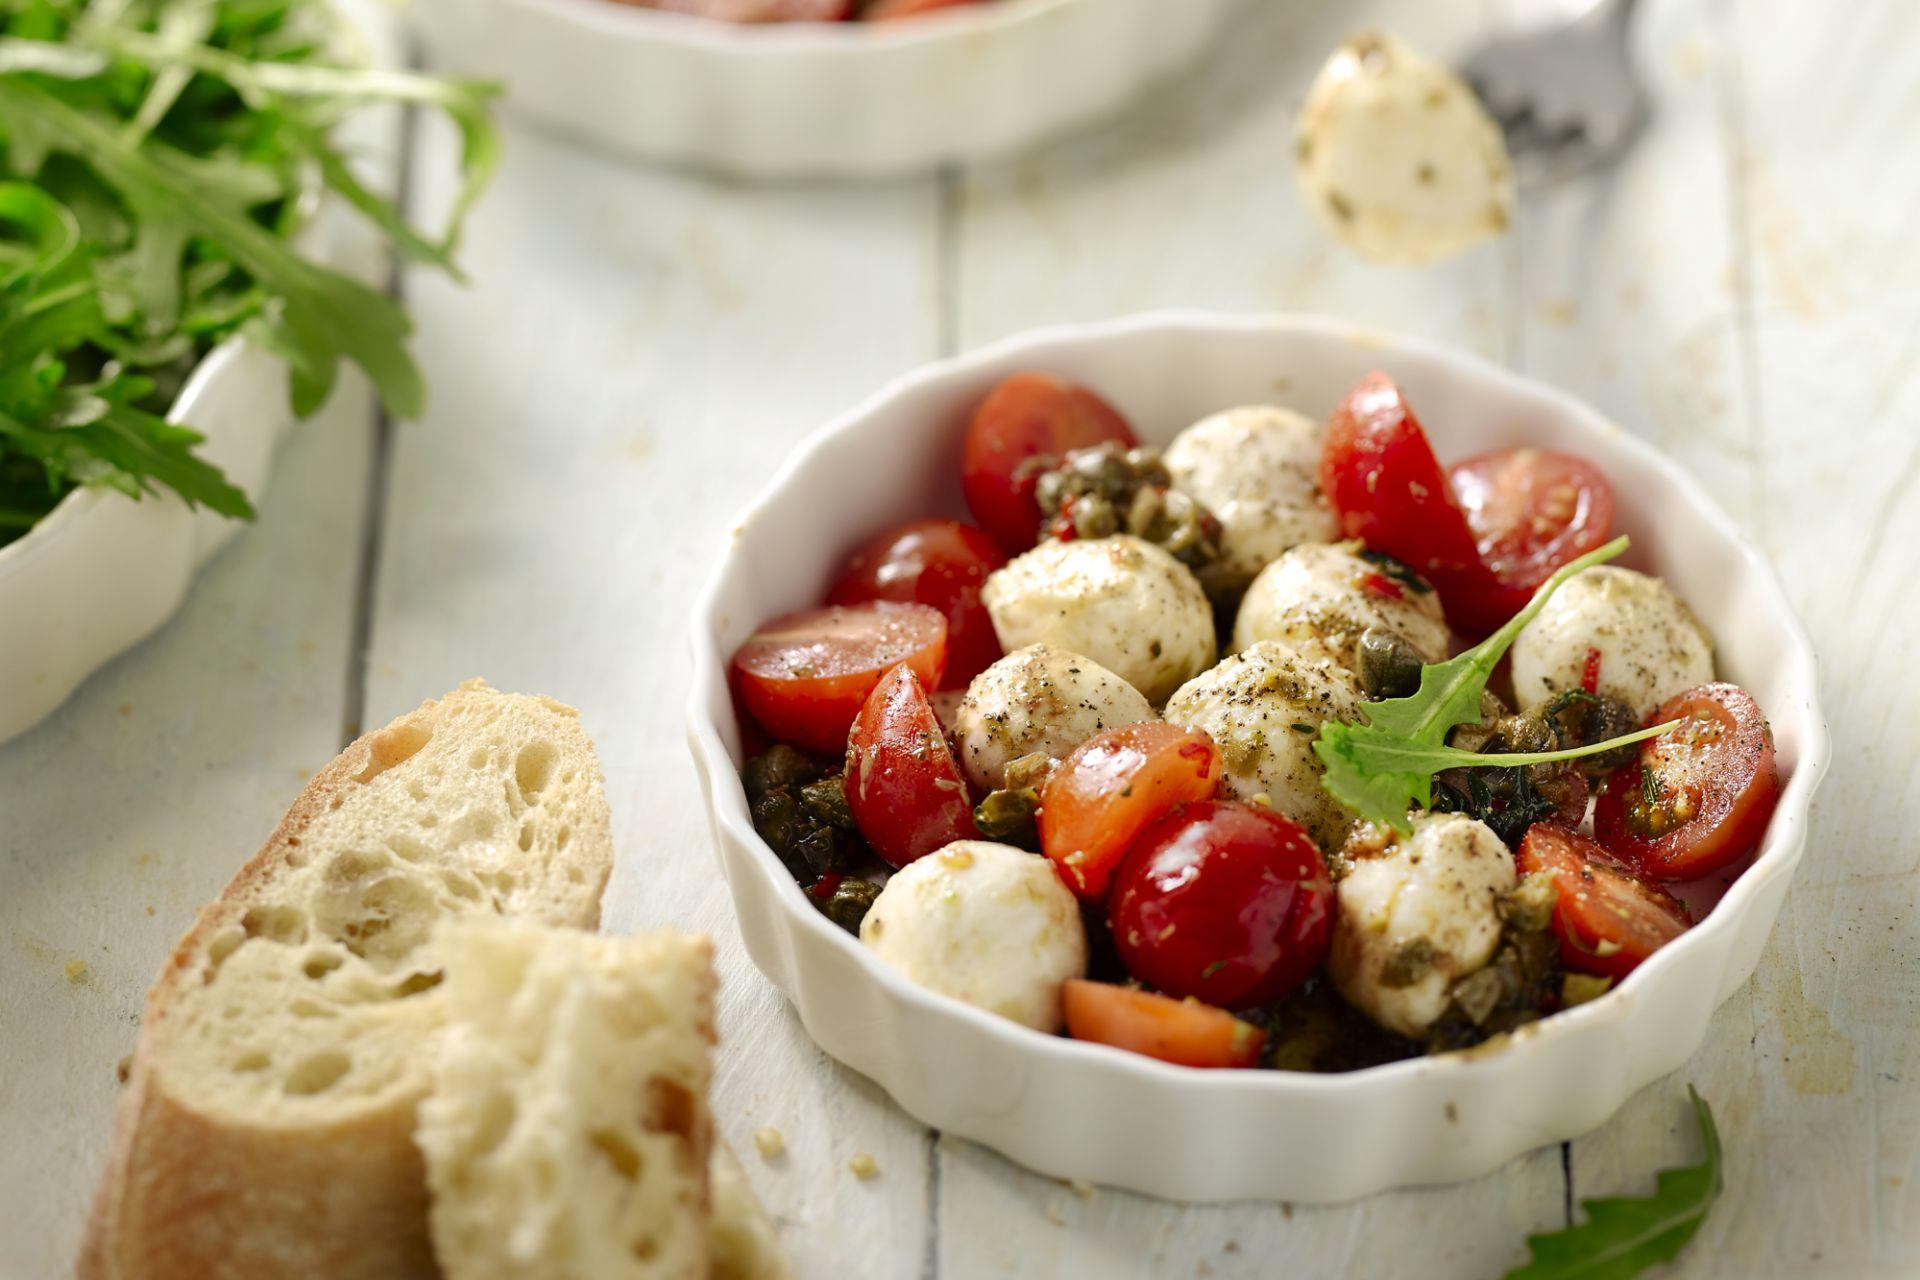 Salade met mozzarella en kappertjes